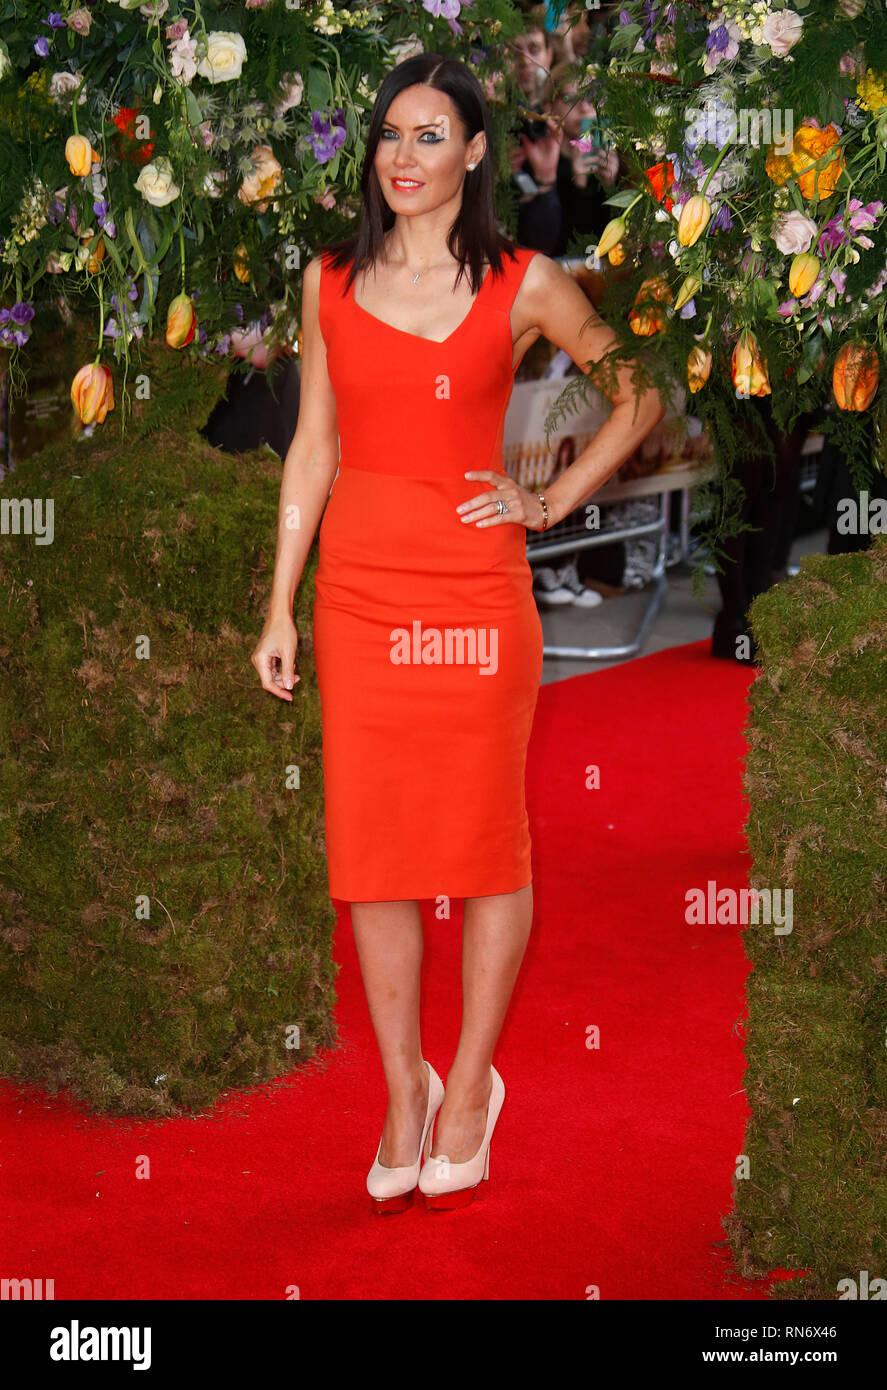 Apr 13, 2015 - London, England, UK - A Little Chaos UK Premiere, Odeon Kensington - Red Carpet Arrivals Photo Shows: Linzi Stoppard - Stock Image